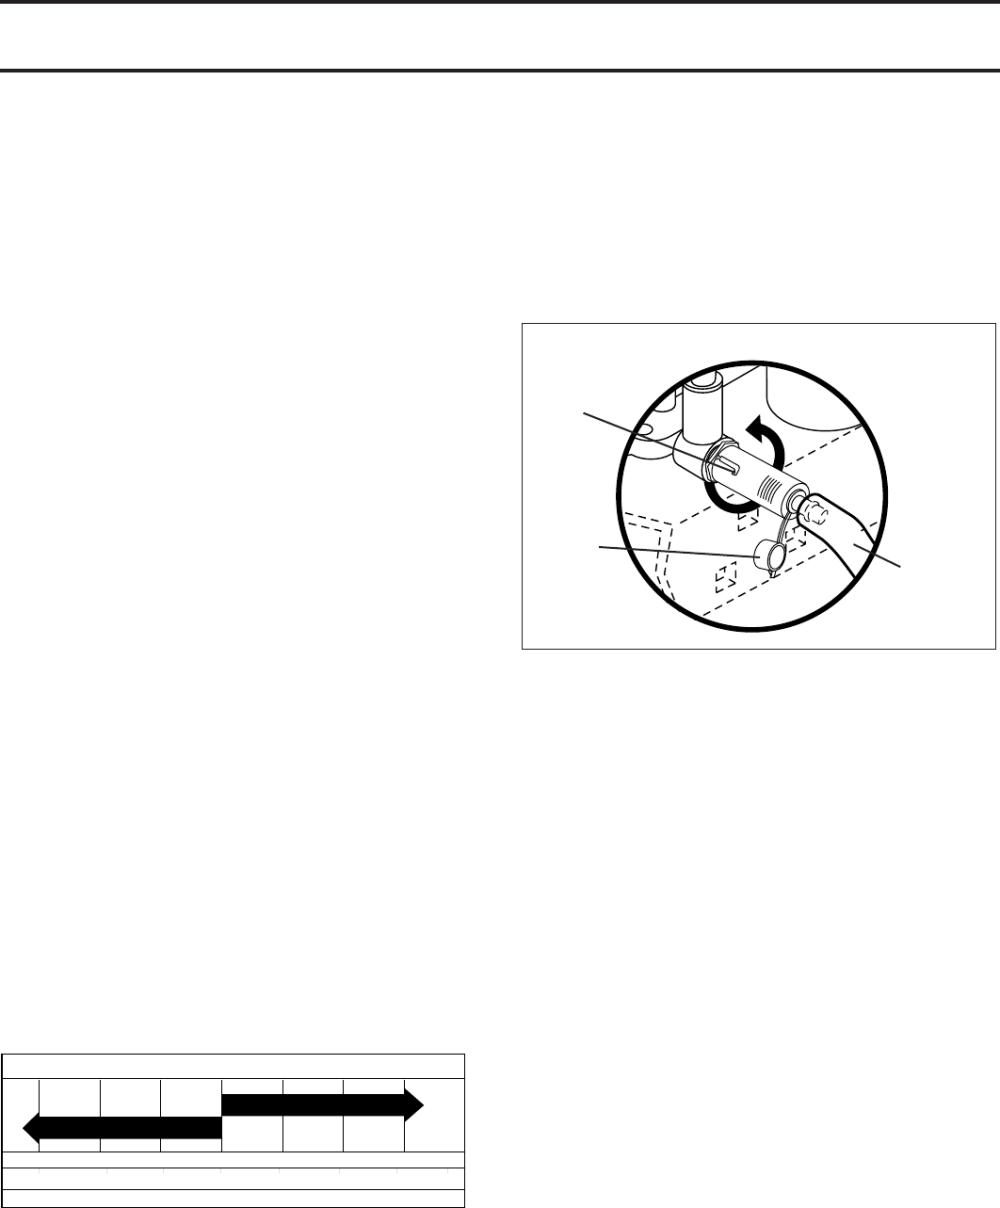 medium resolution of 17